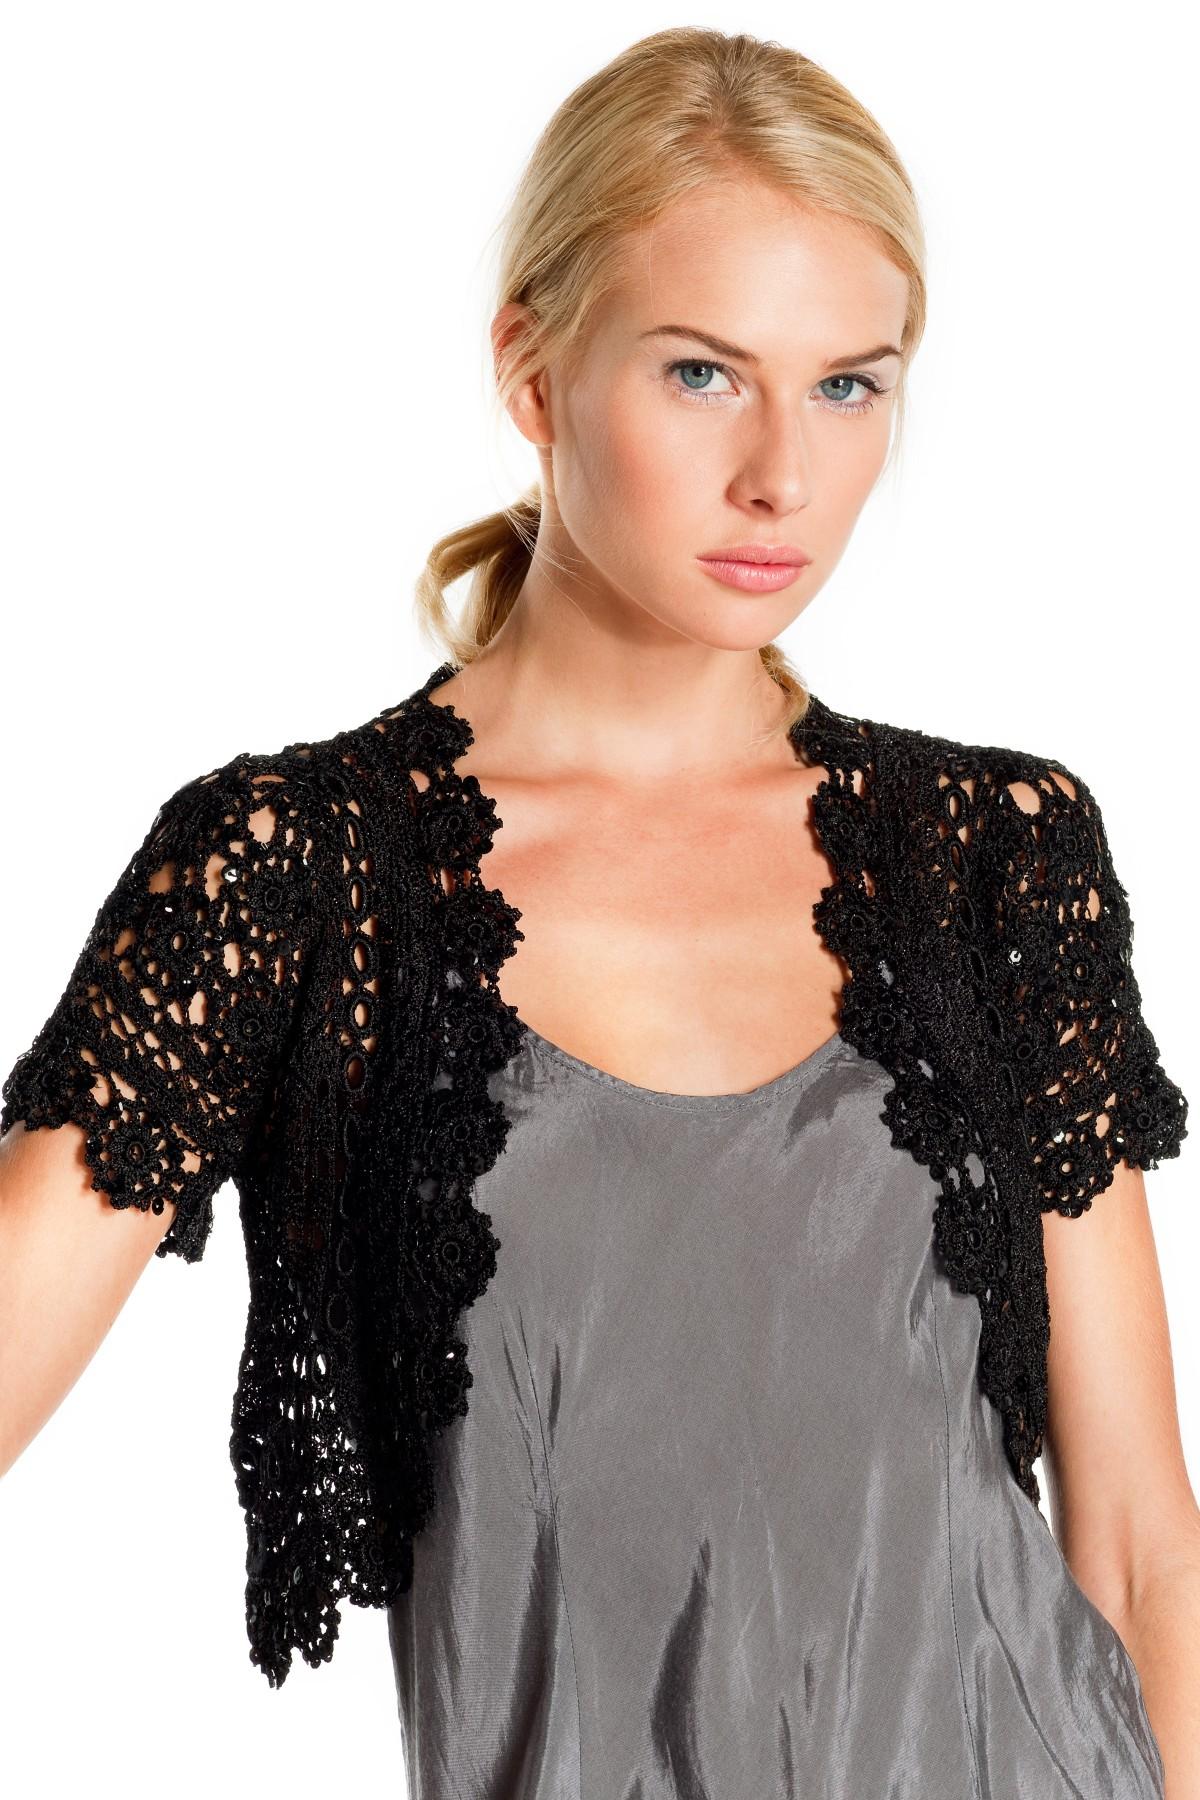 Détails - Short sleeve bolero in viscose crochet. Top Pacte Gilet